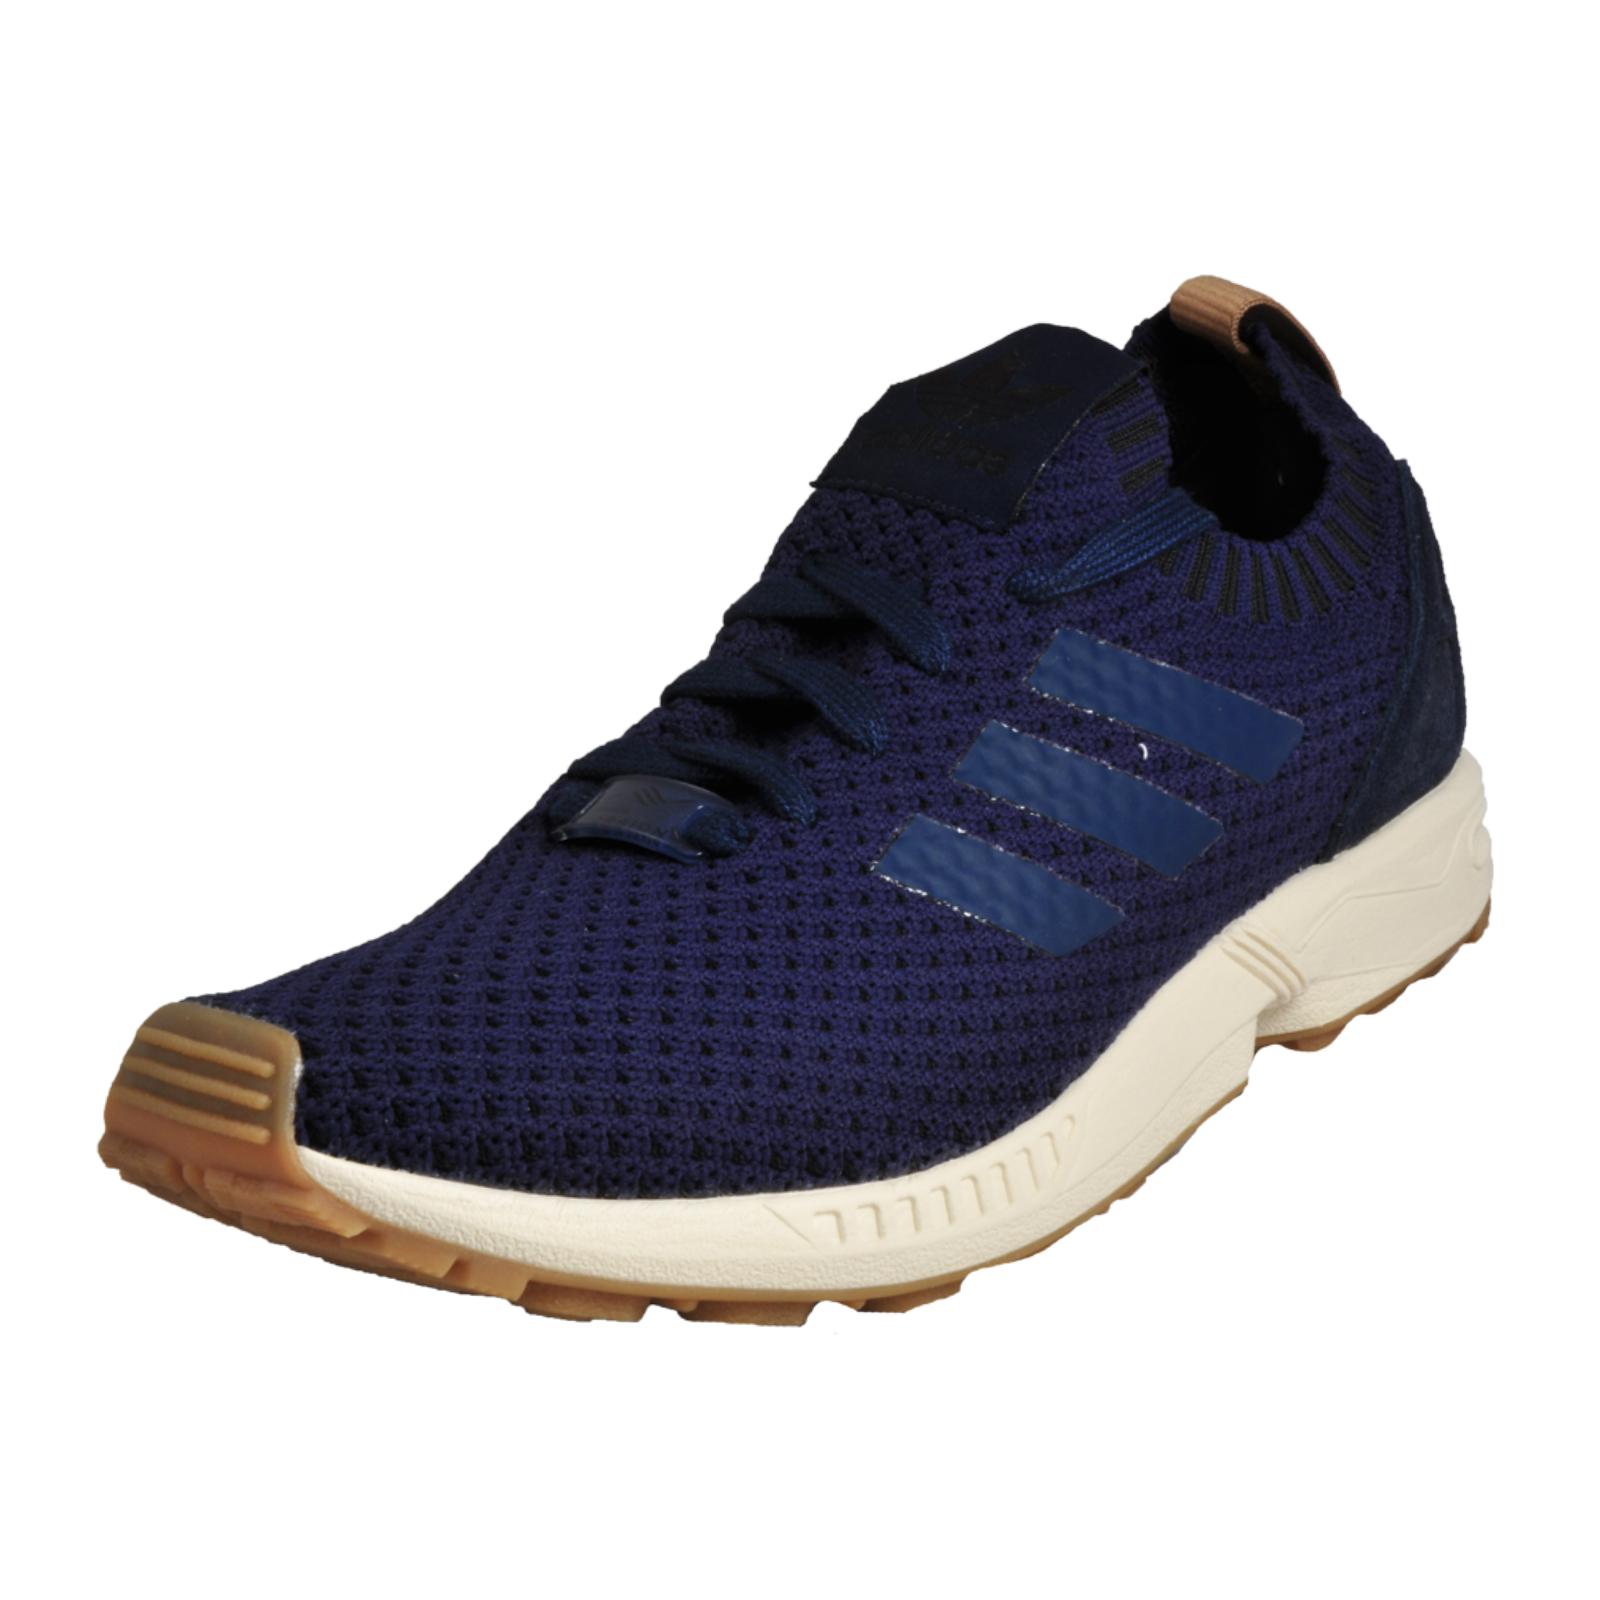 9af567d57 Details about Adidas Originals ZX Flux PK Primeknir Men s Causal Gym  Fashion Trainers Navy